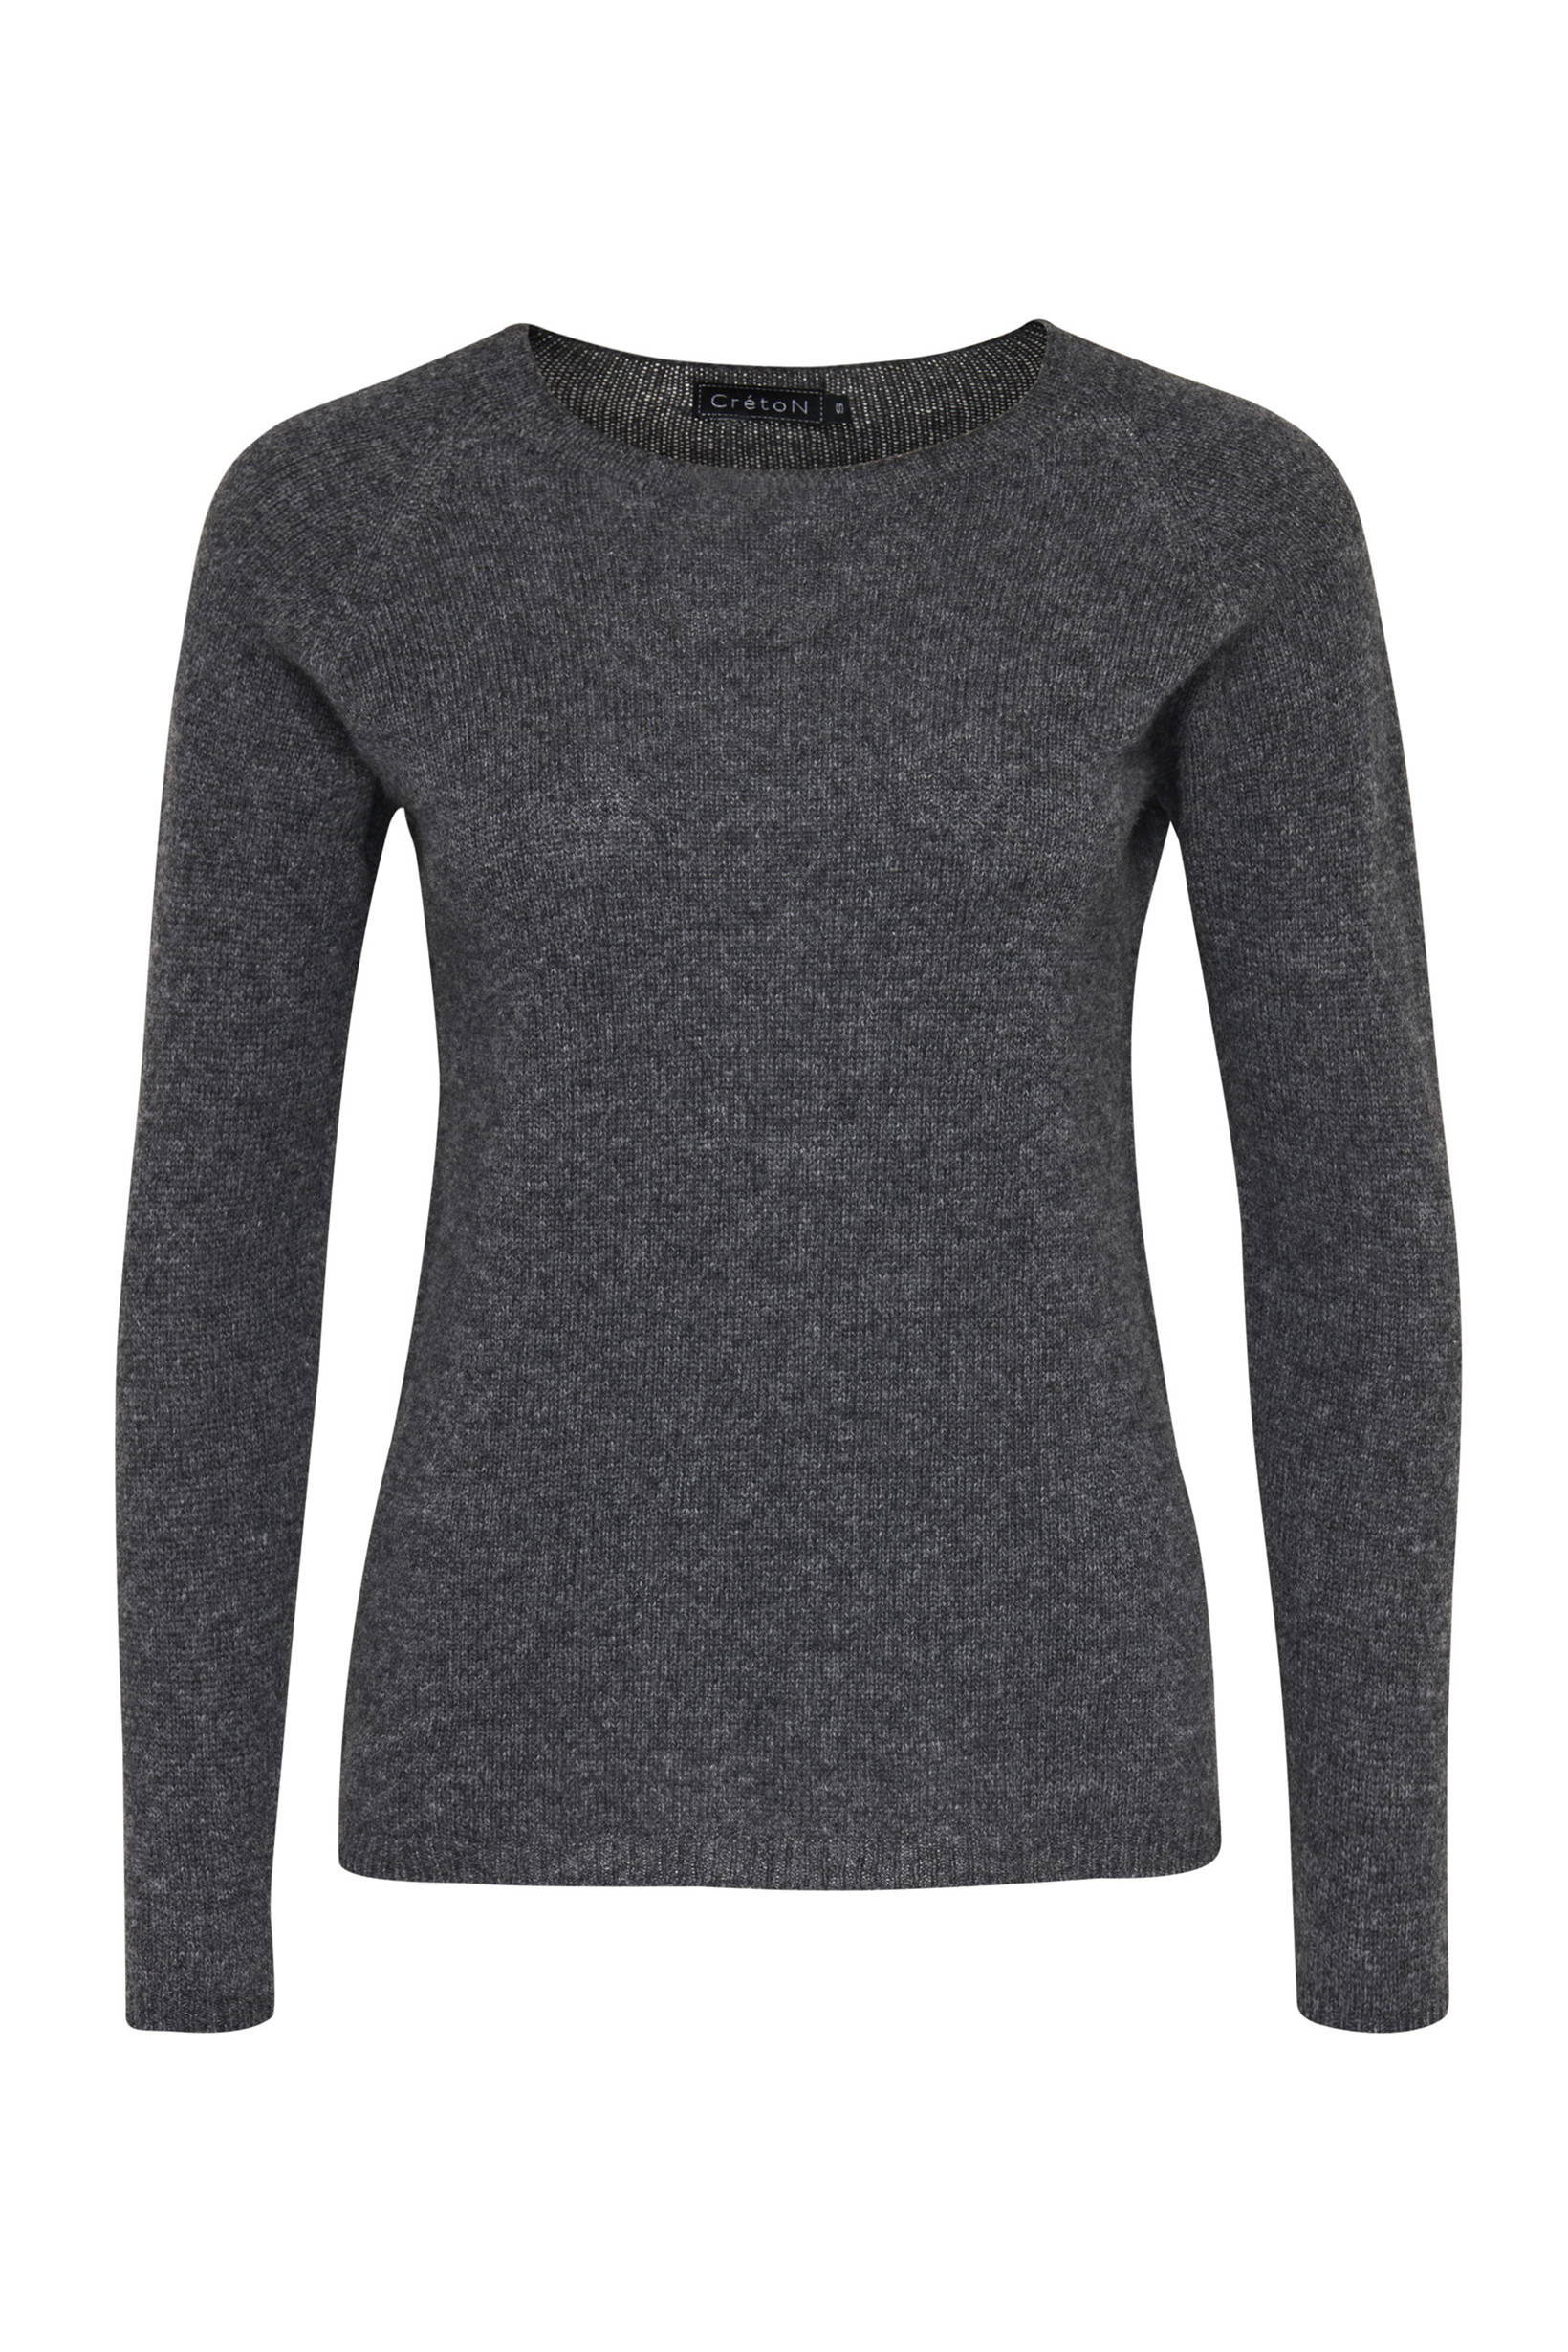 CRÉTON Linea kashmir sweater 214 S